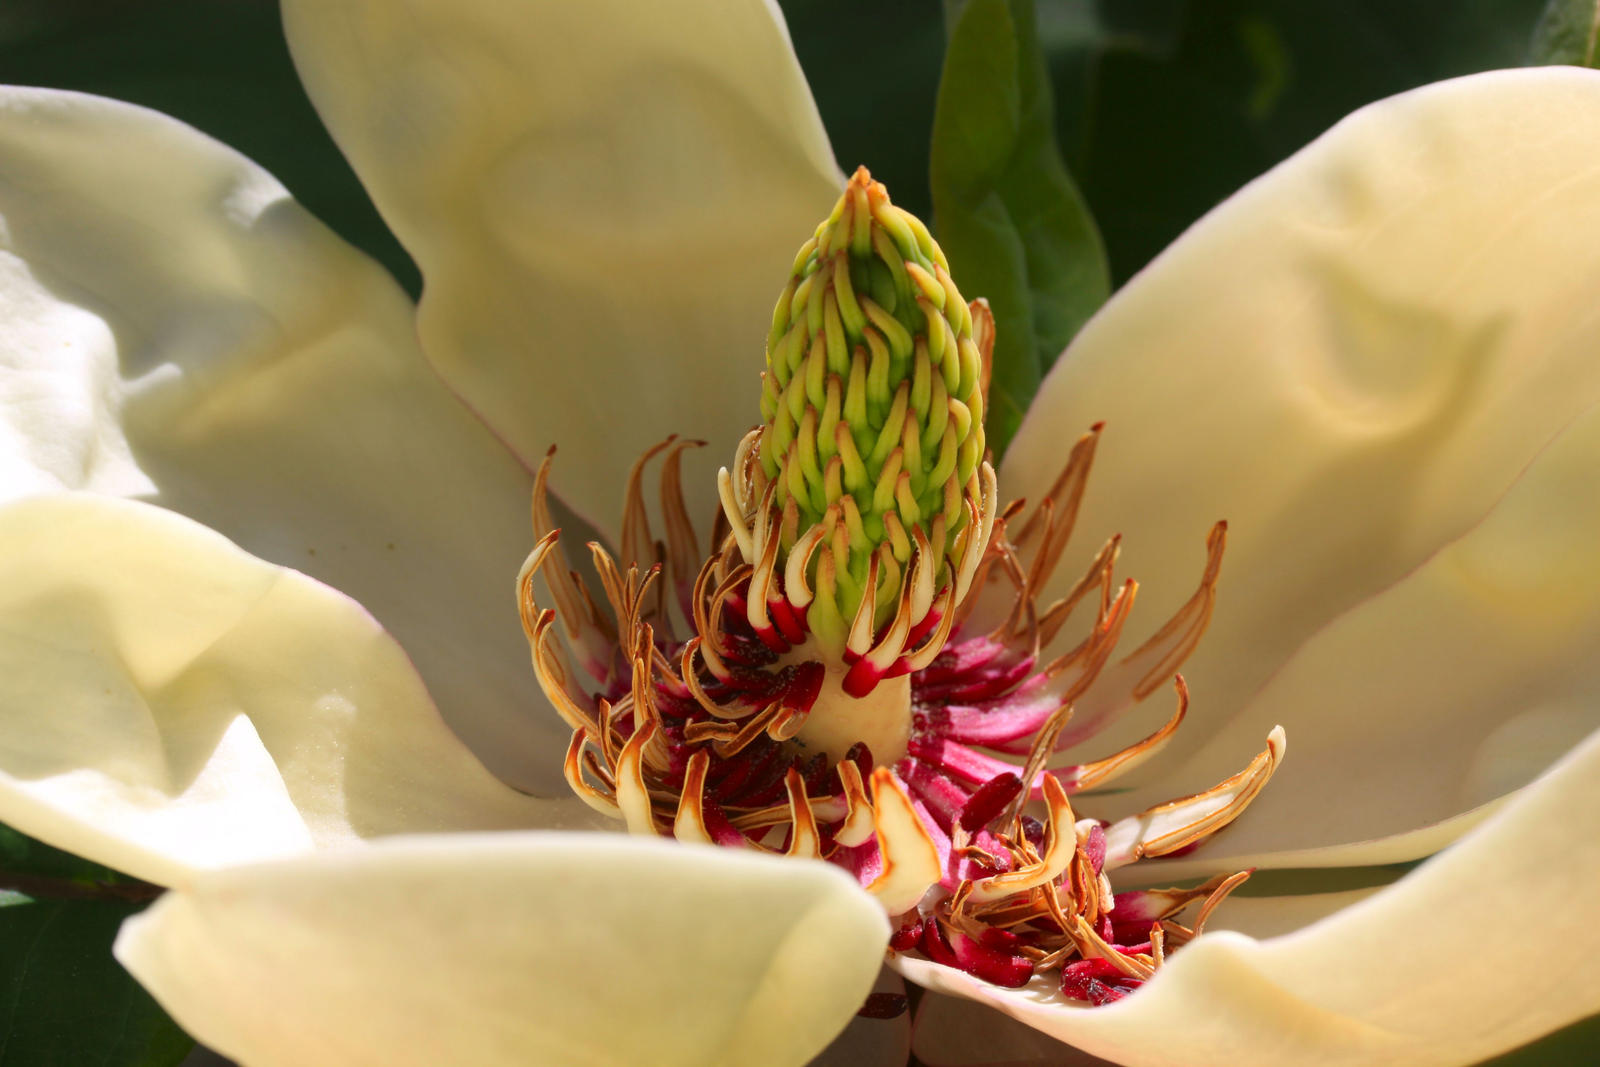 Magnolia obovata (Japanese Bigleaf Magnolia) by Caloxort